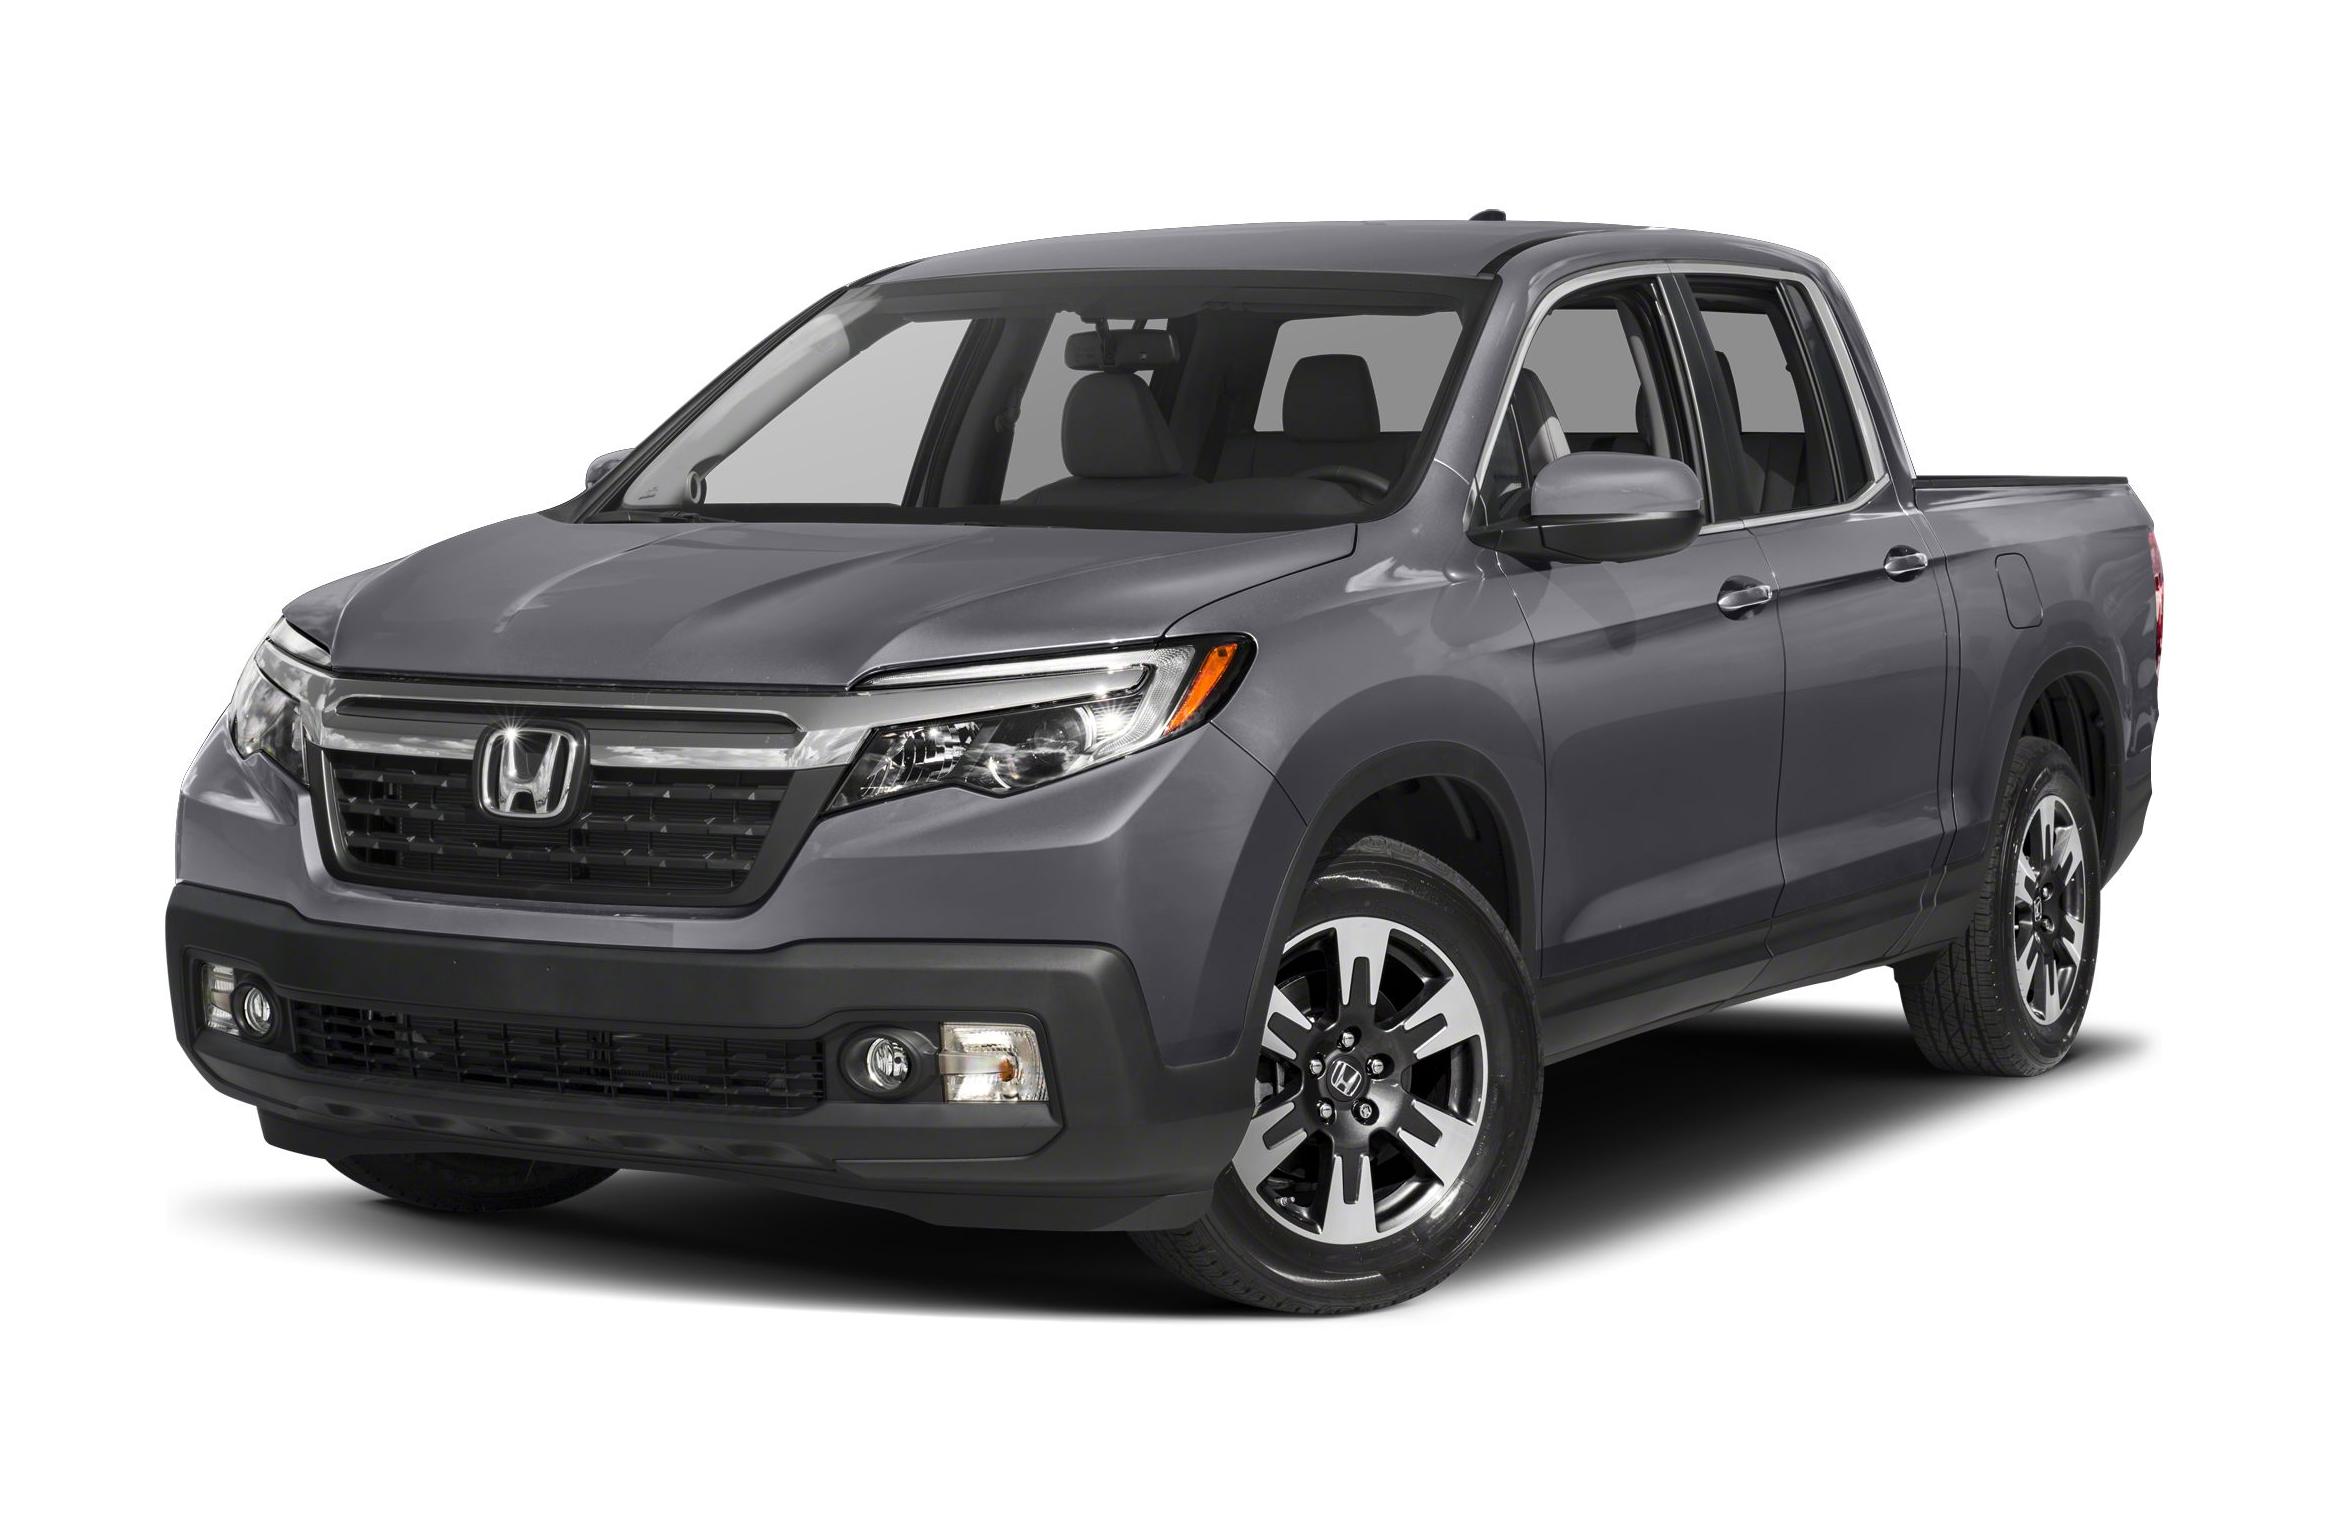 2017 Honda Ridgeline RTL-T (from $30,950)